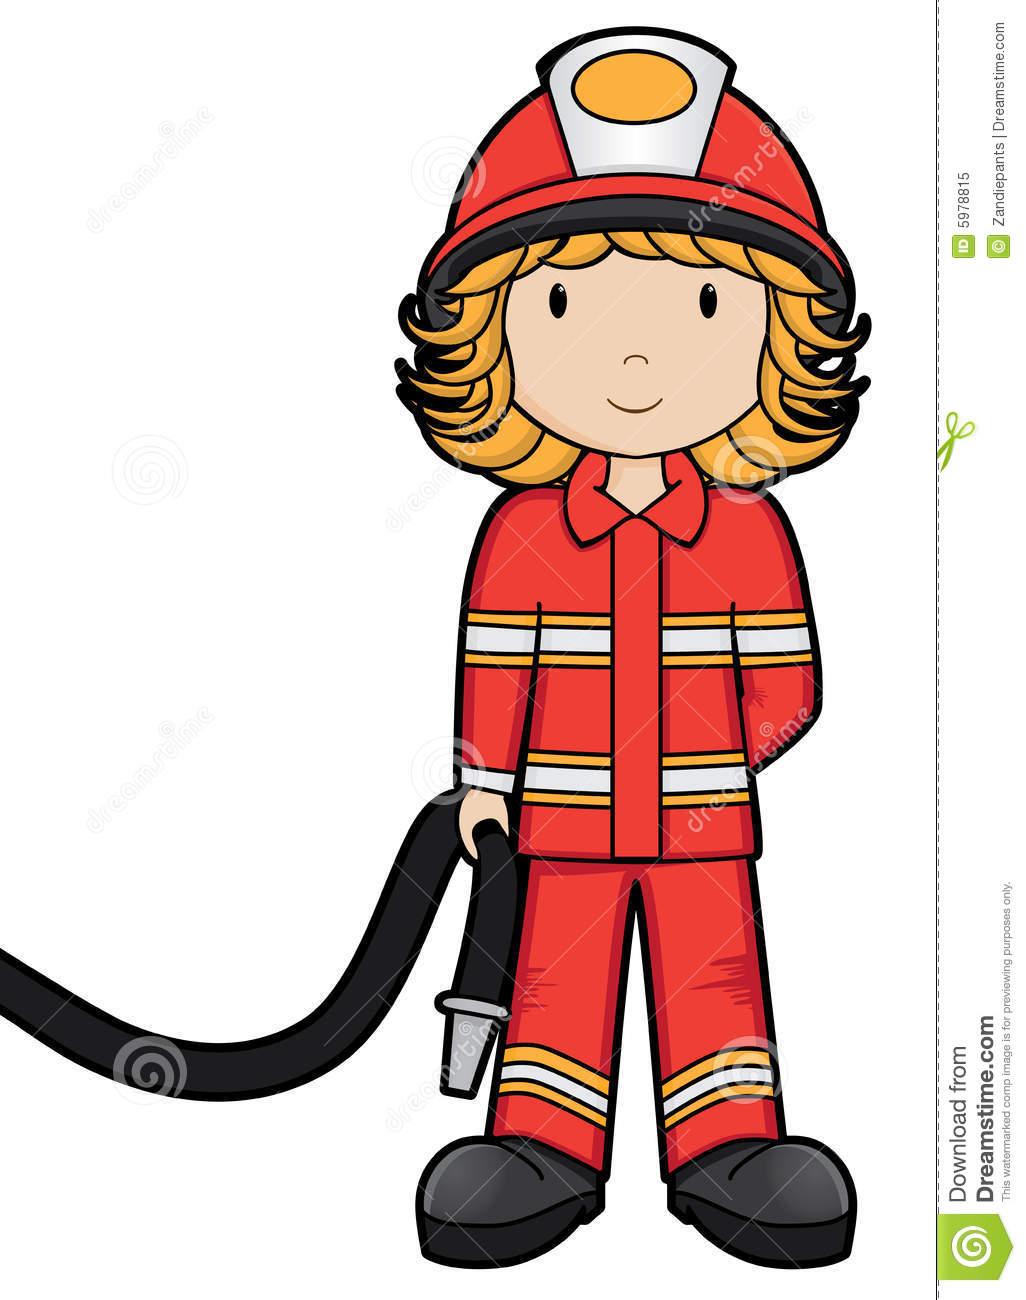 Fire Fighter Clip Art. Fire Girl Vector -Fire Fighter Clip Art. Fire Girl Vector Royalty Free Stock Photo Image 5978815-1